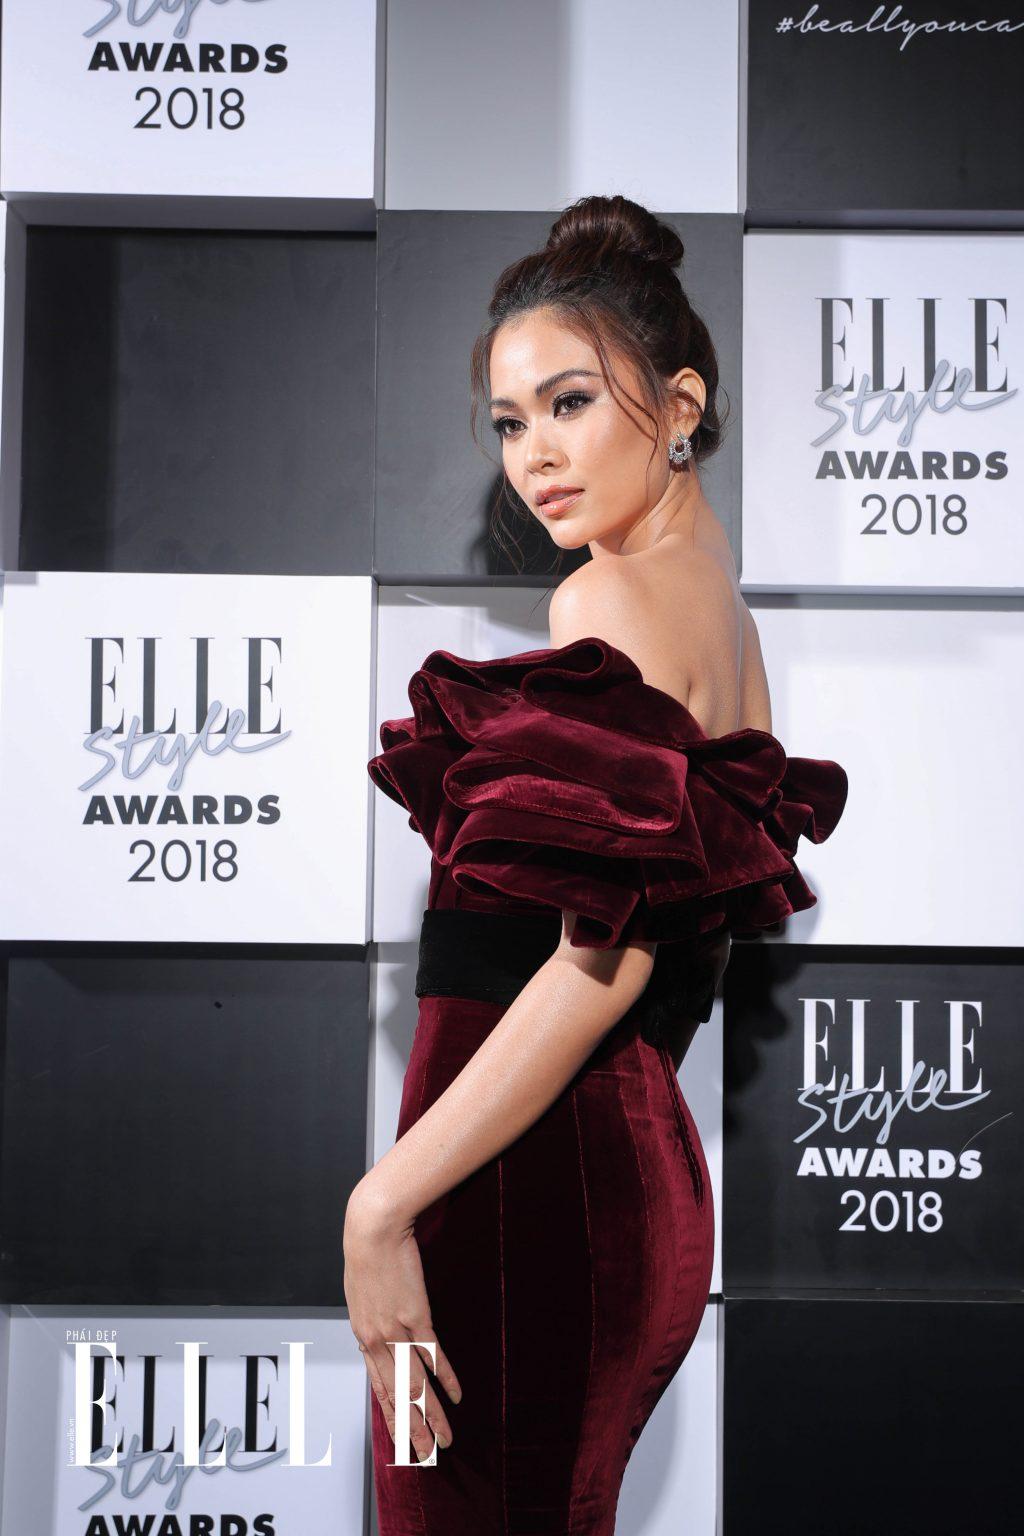 ELLE Style Awards 2018 Mâu Thuỷ